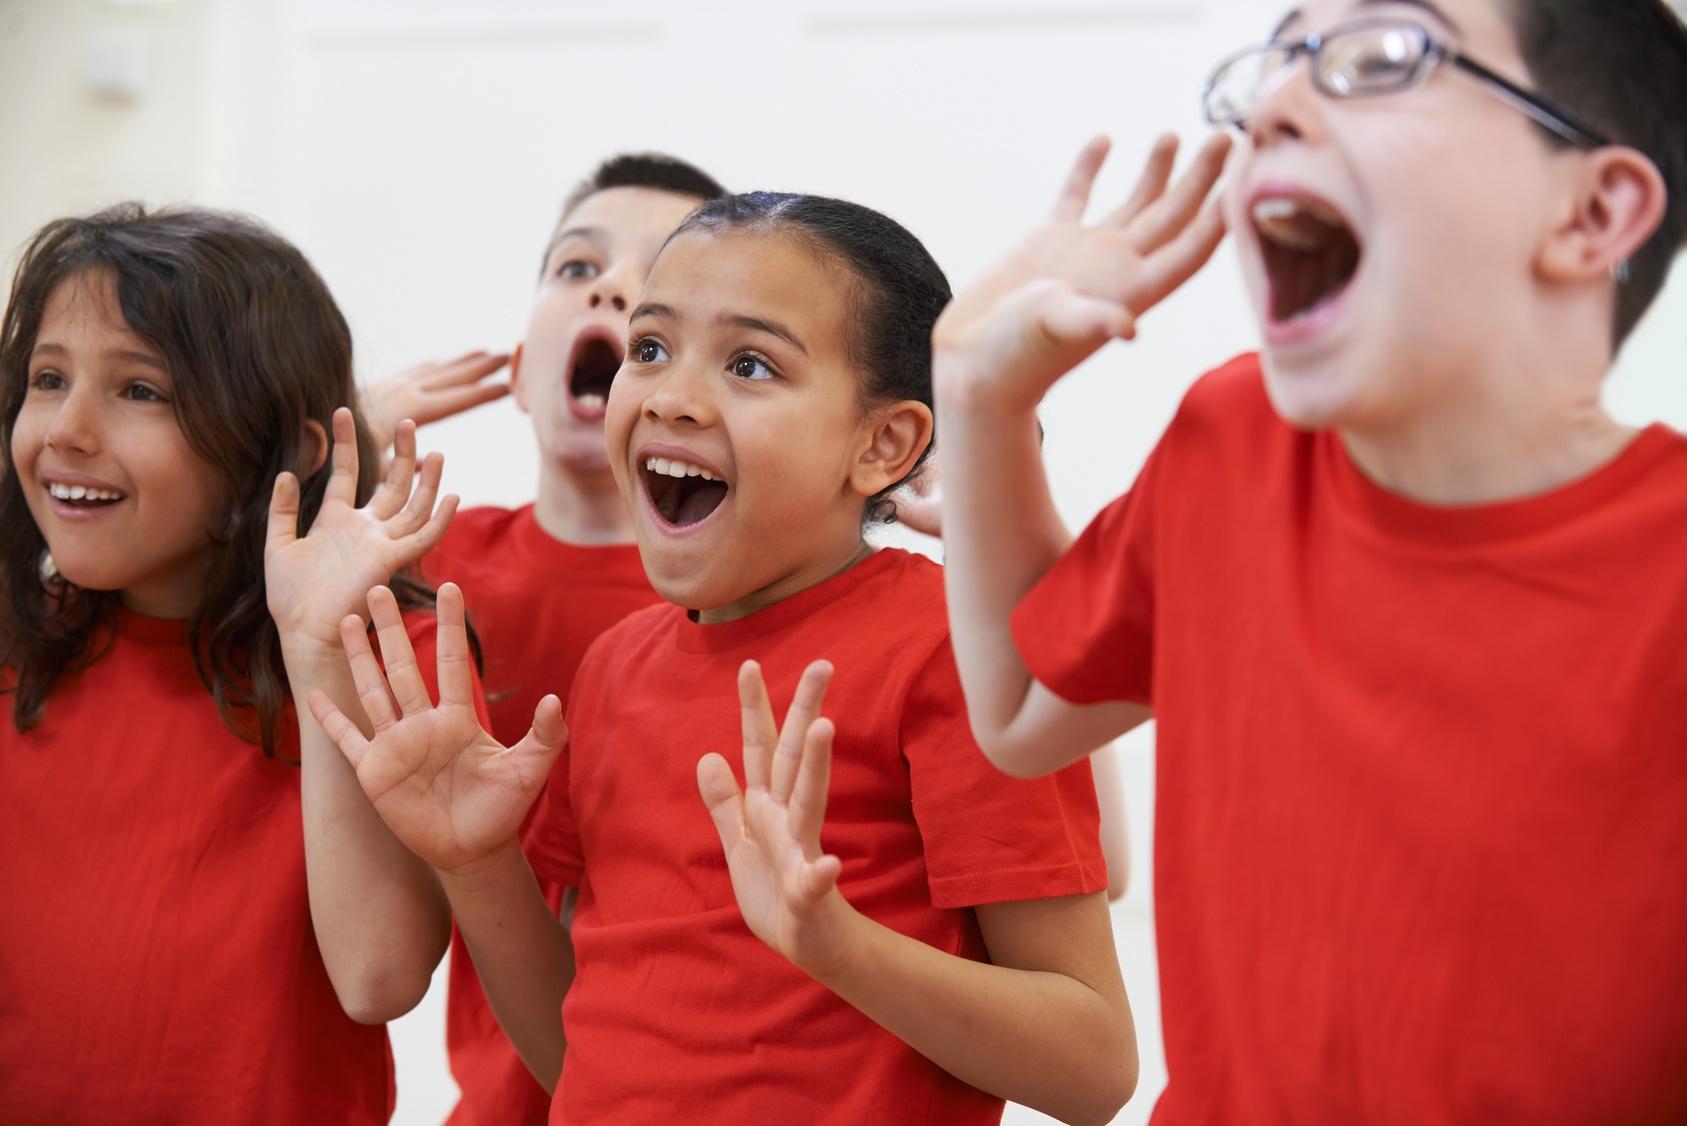 acting_classes_for_kids_flemington